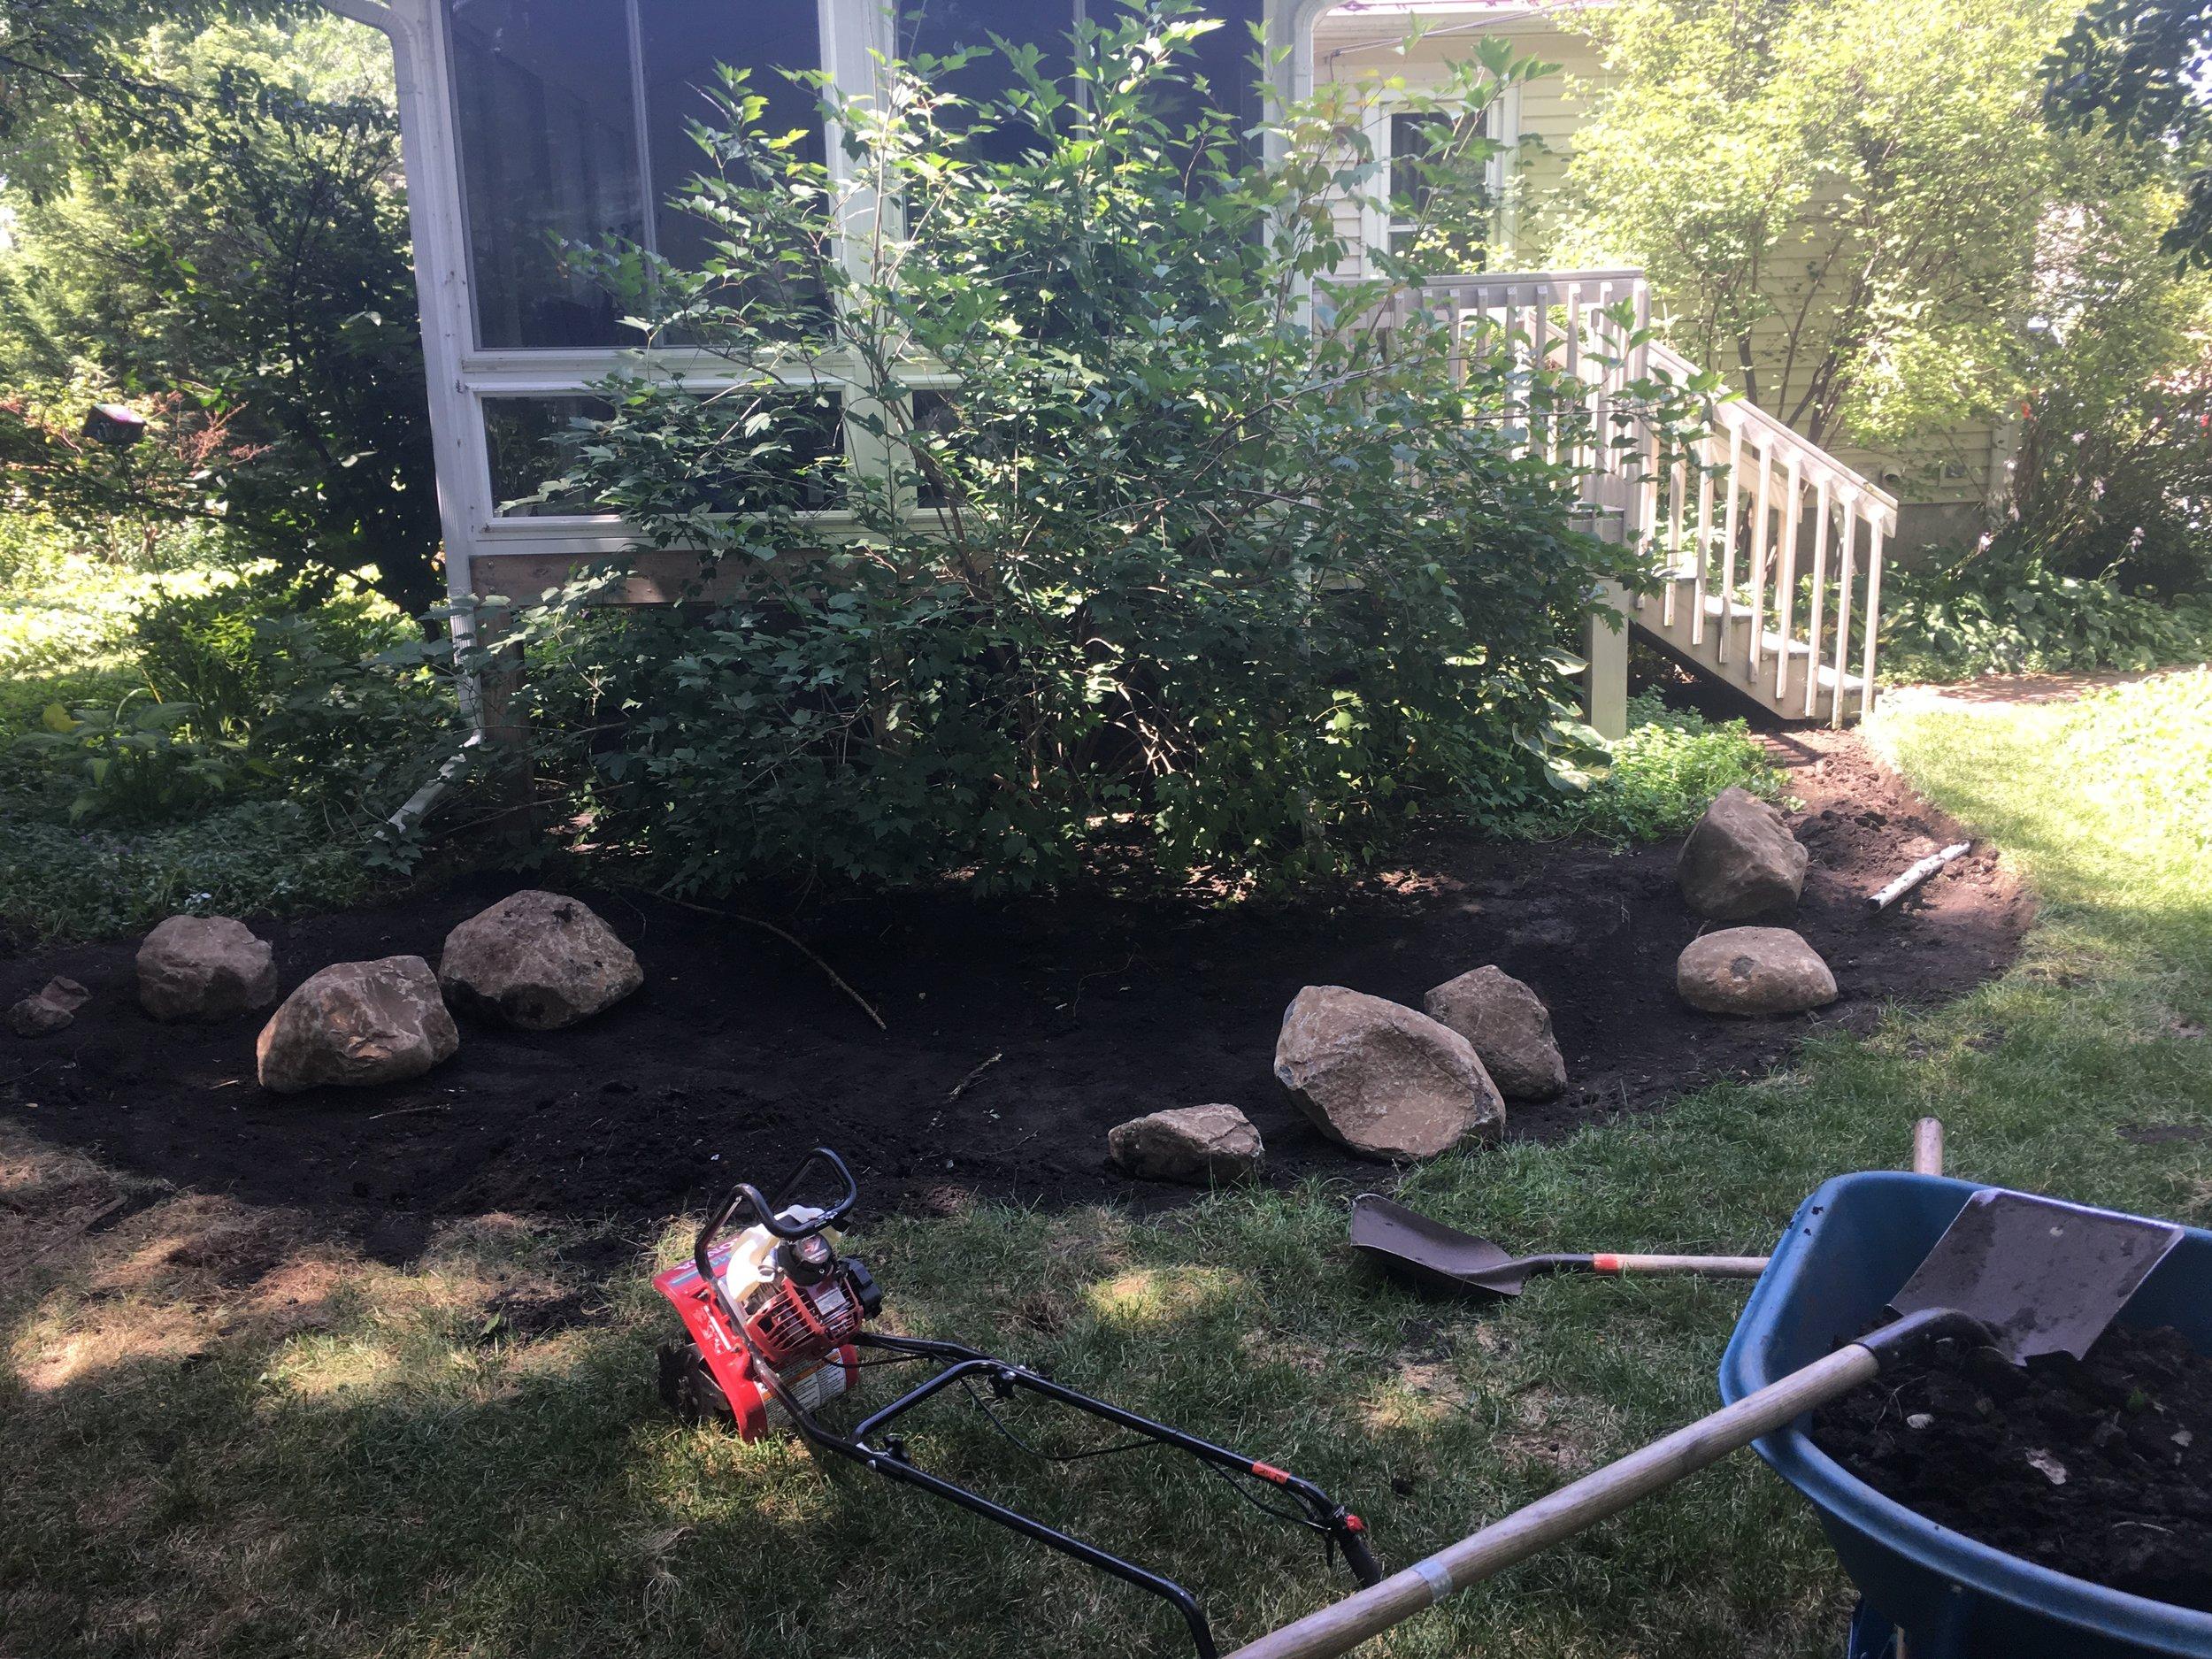 Rain Garden in Progress